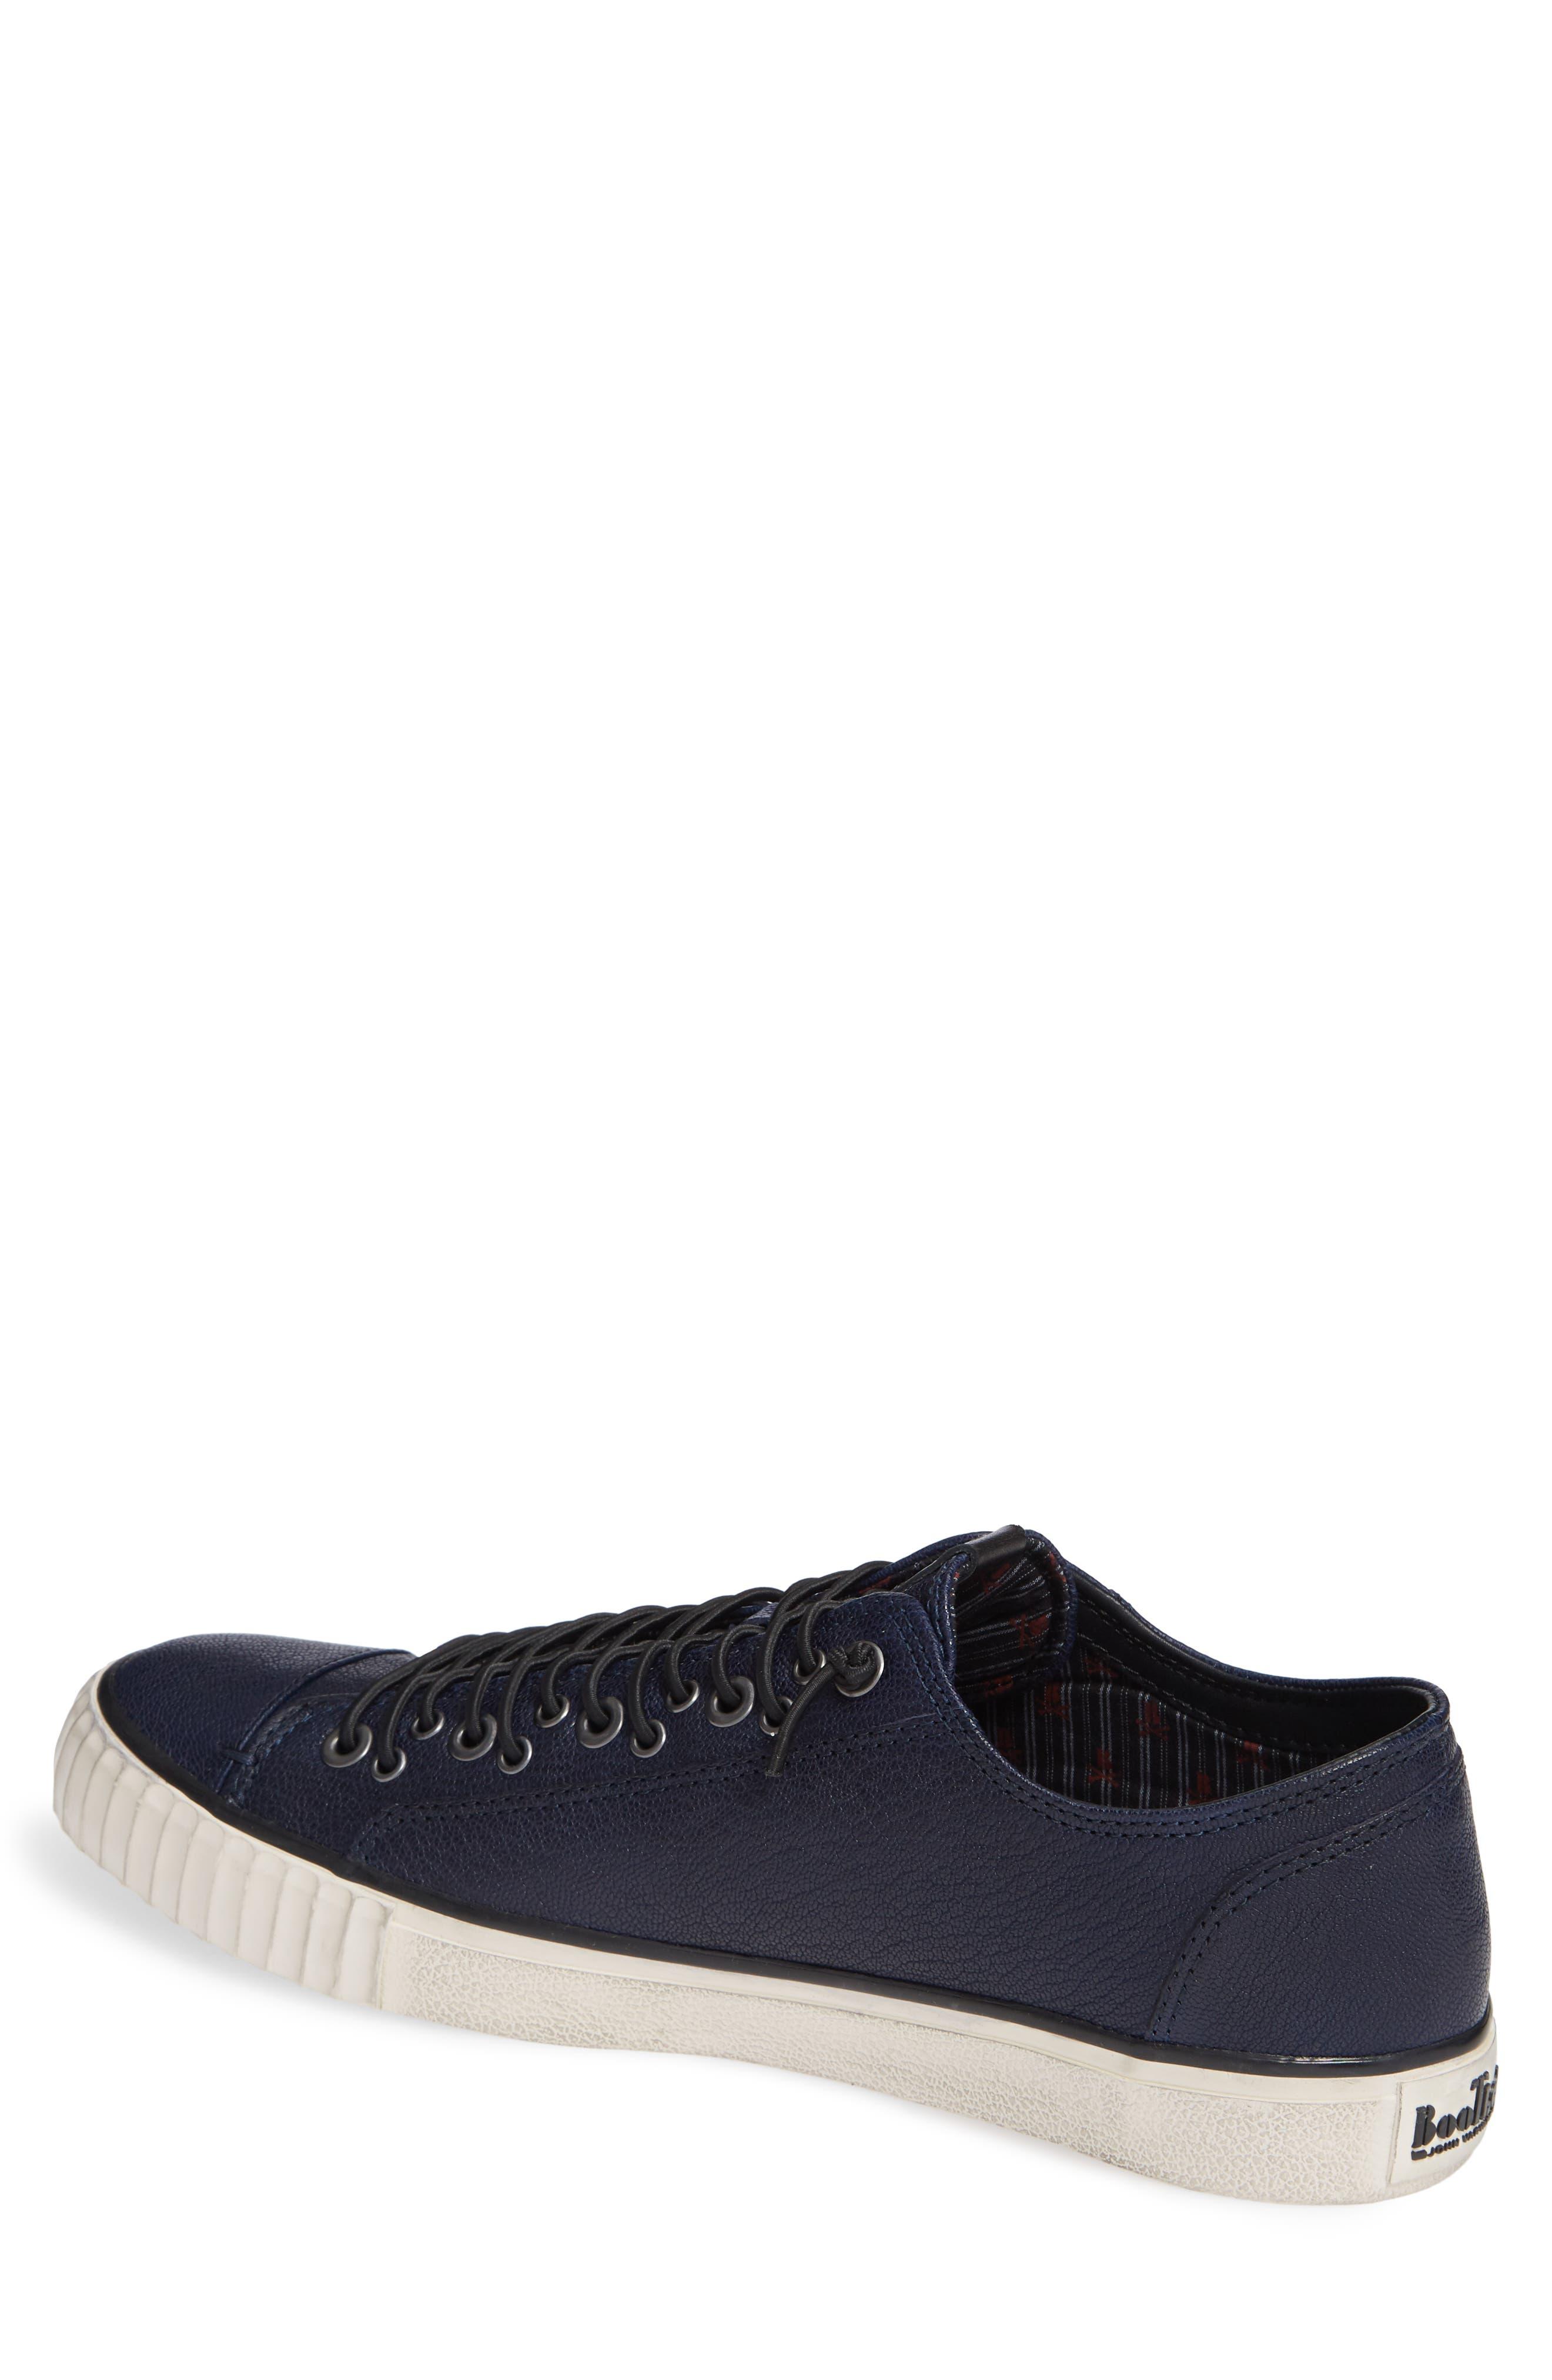 John Varvatos Star USA Bootleg Low Top Sneaker,                             Alternate thumbnail 2, color,                             BLUE LEATHER